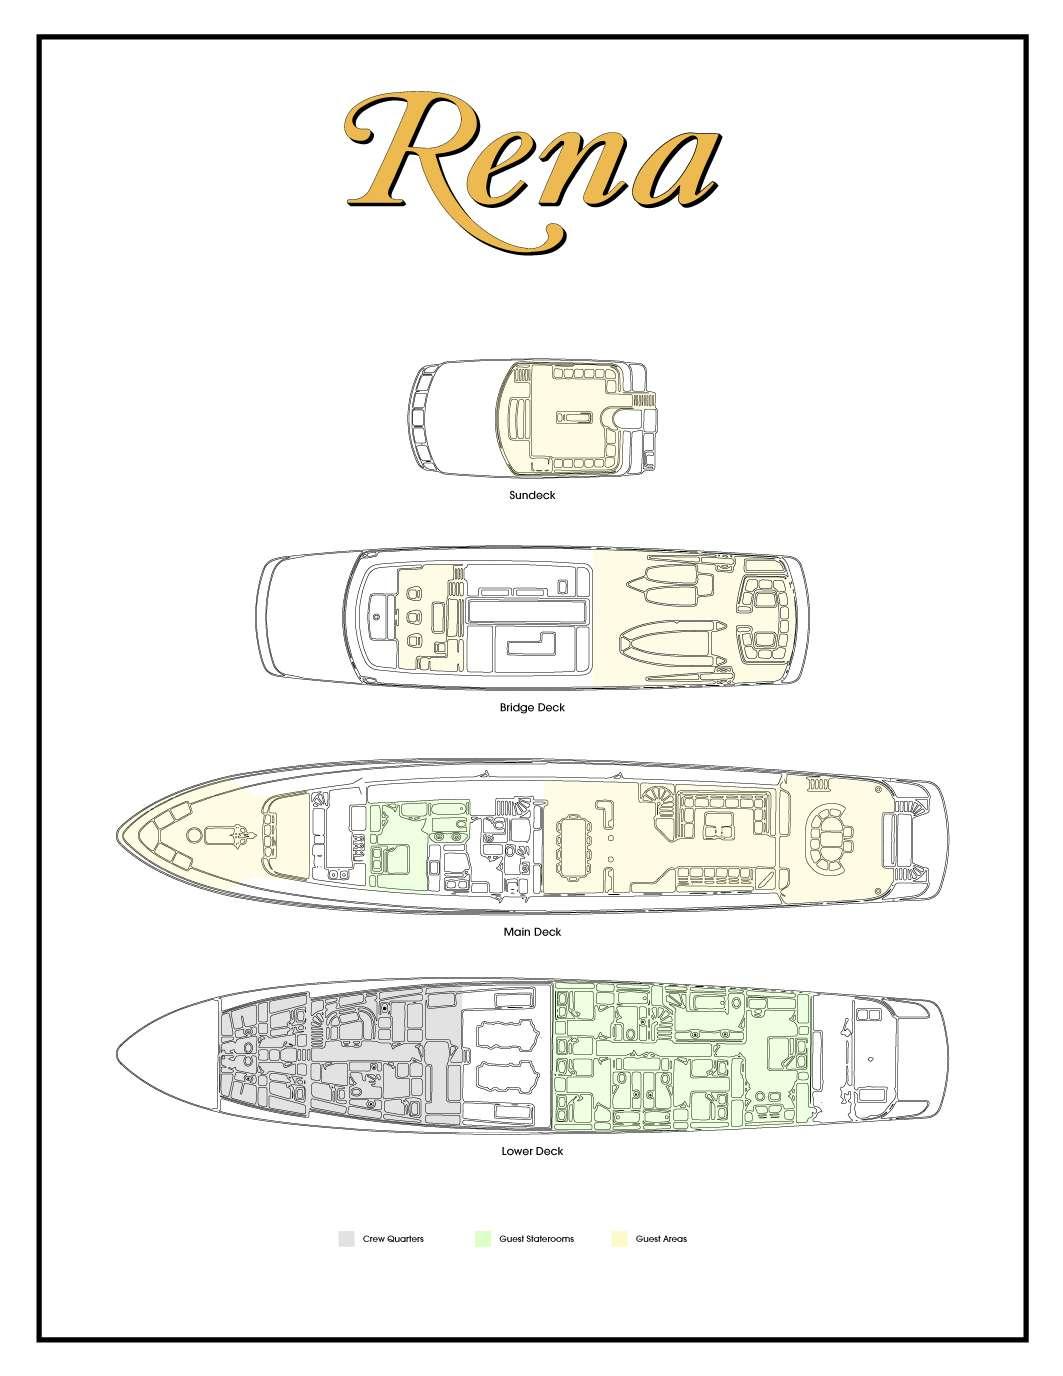 RENA Layout